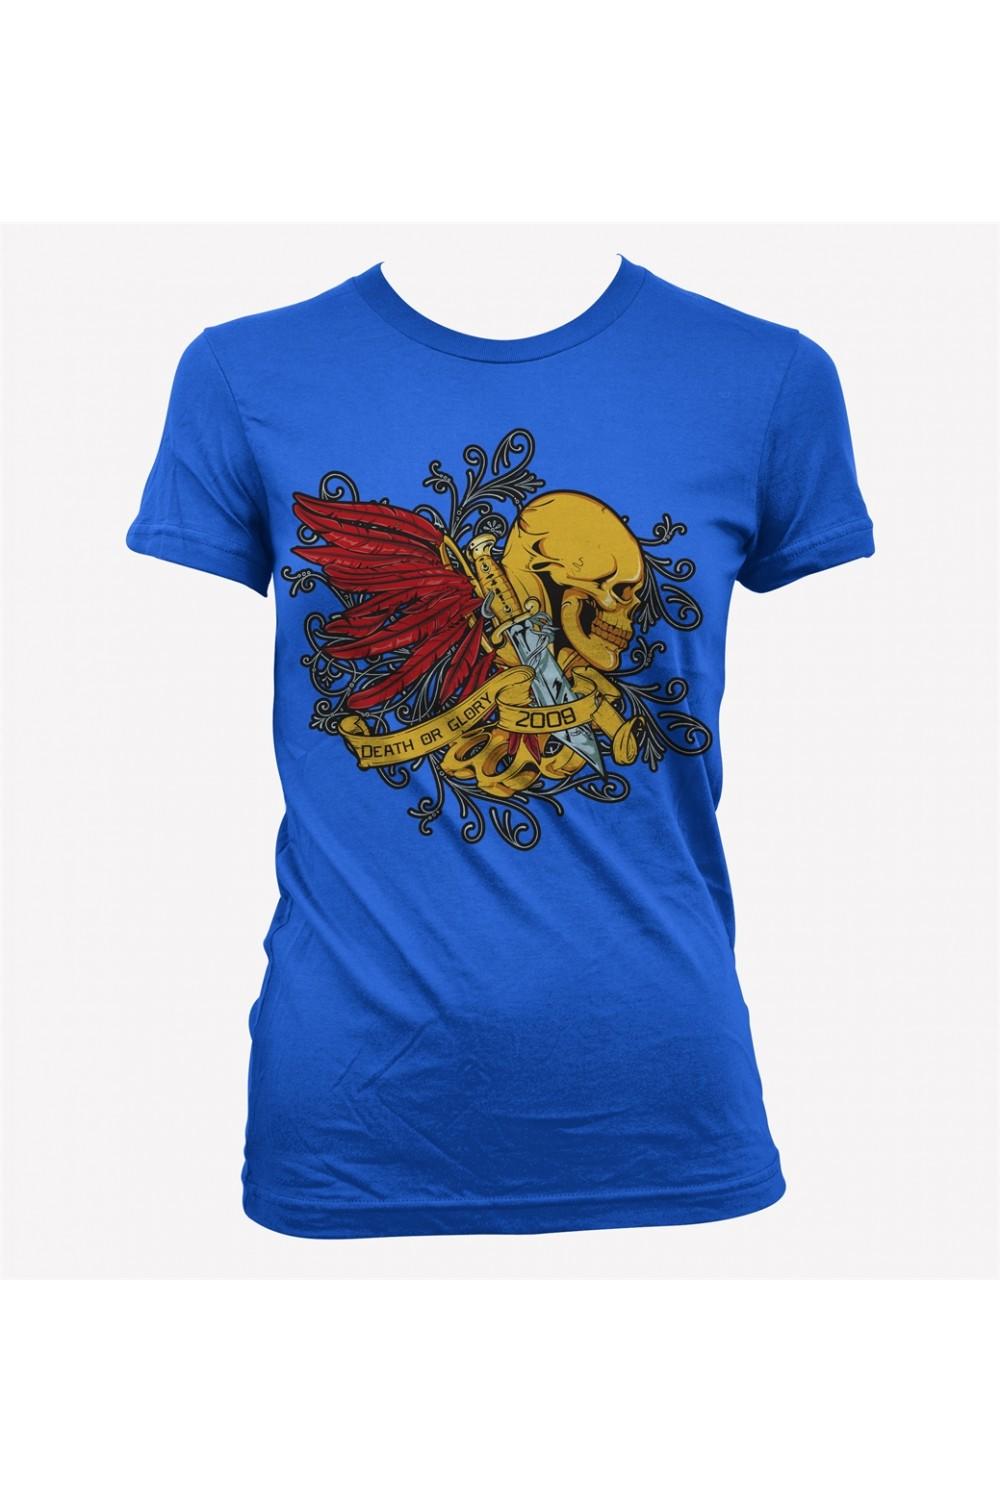 Skulls Lady Printed T Shirt 4001